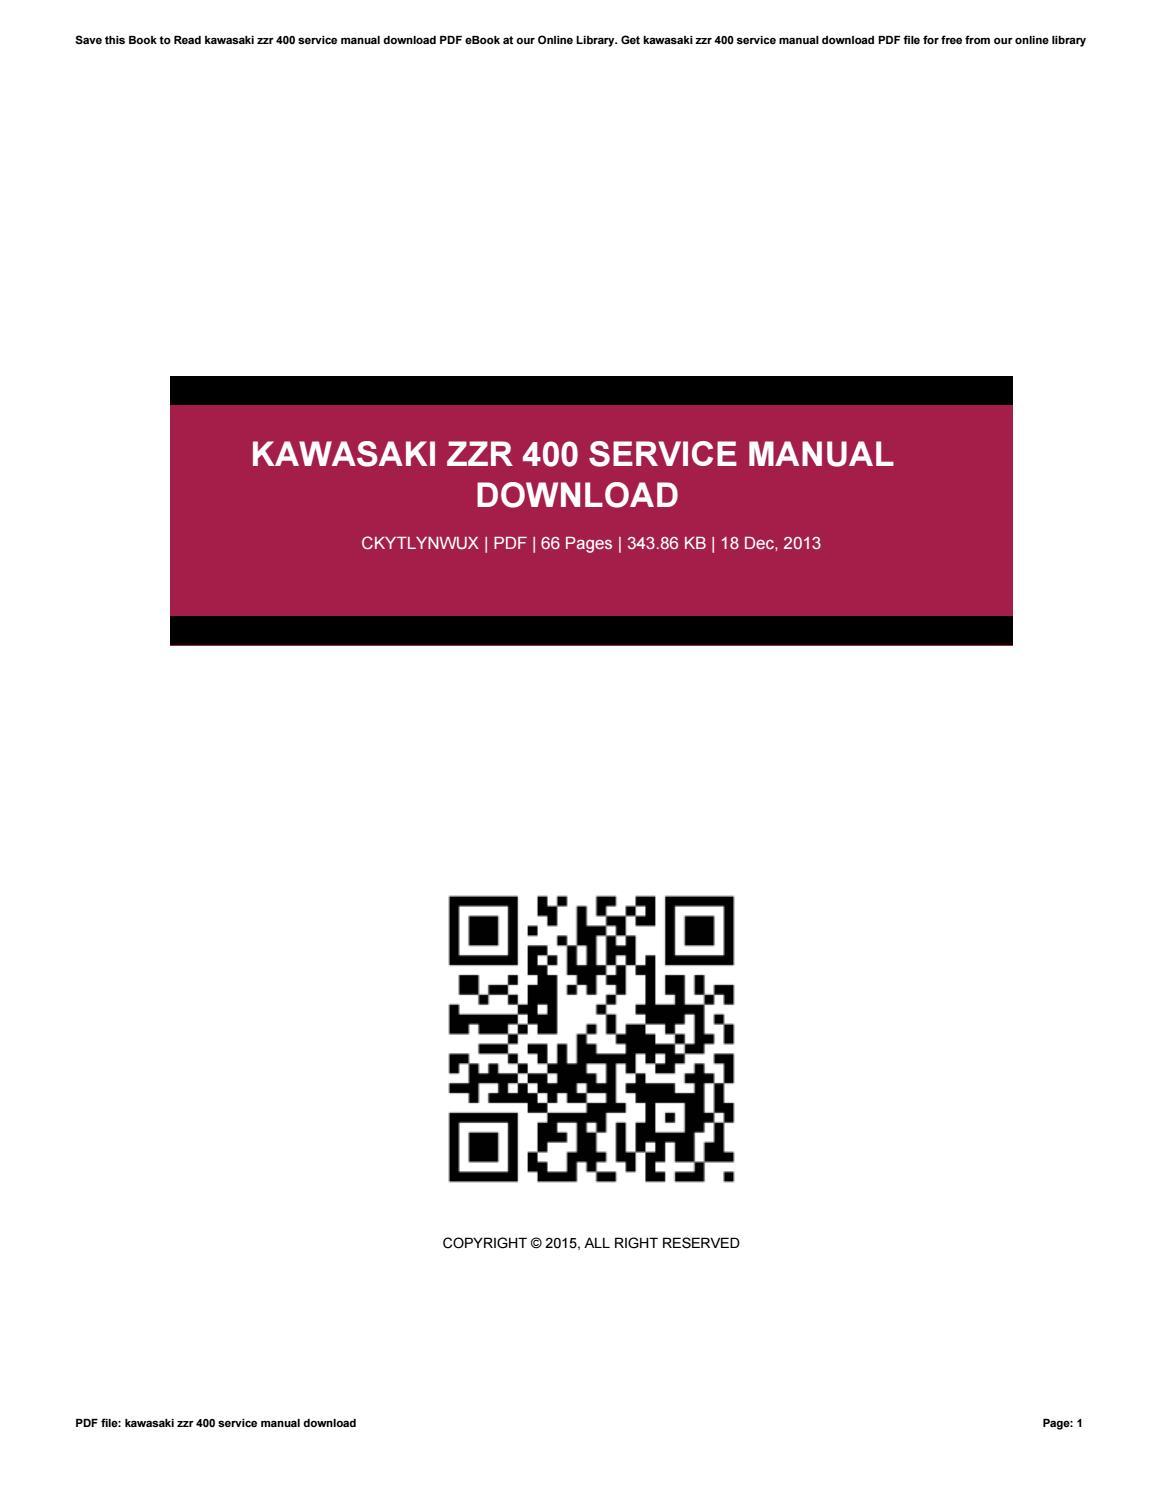 kawasaki zxr400 zxr 400 zx400 1991 2000 service manual repair guide download